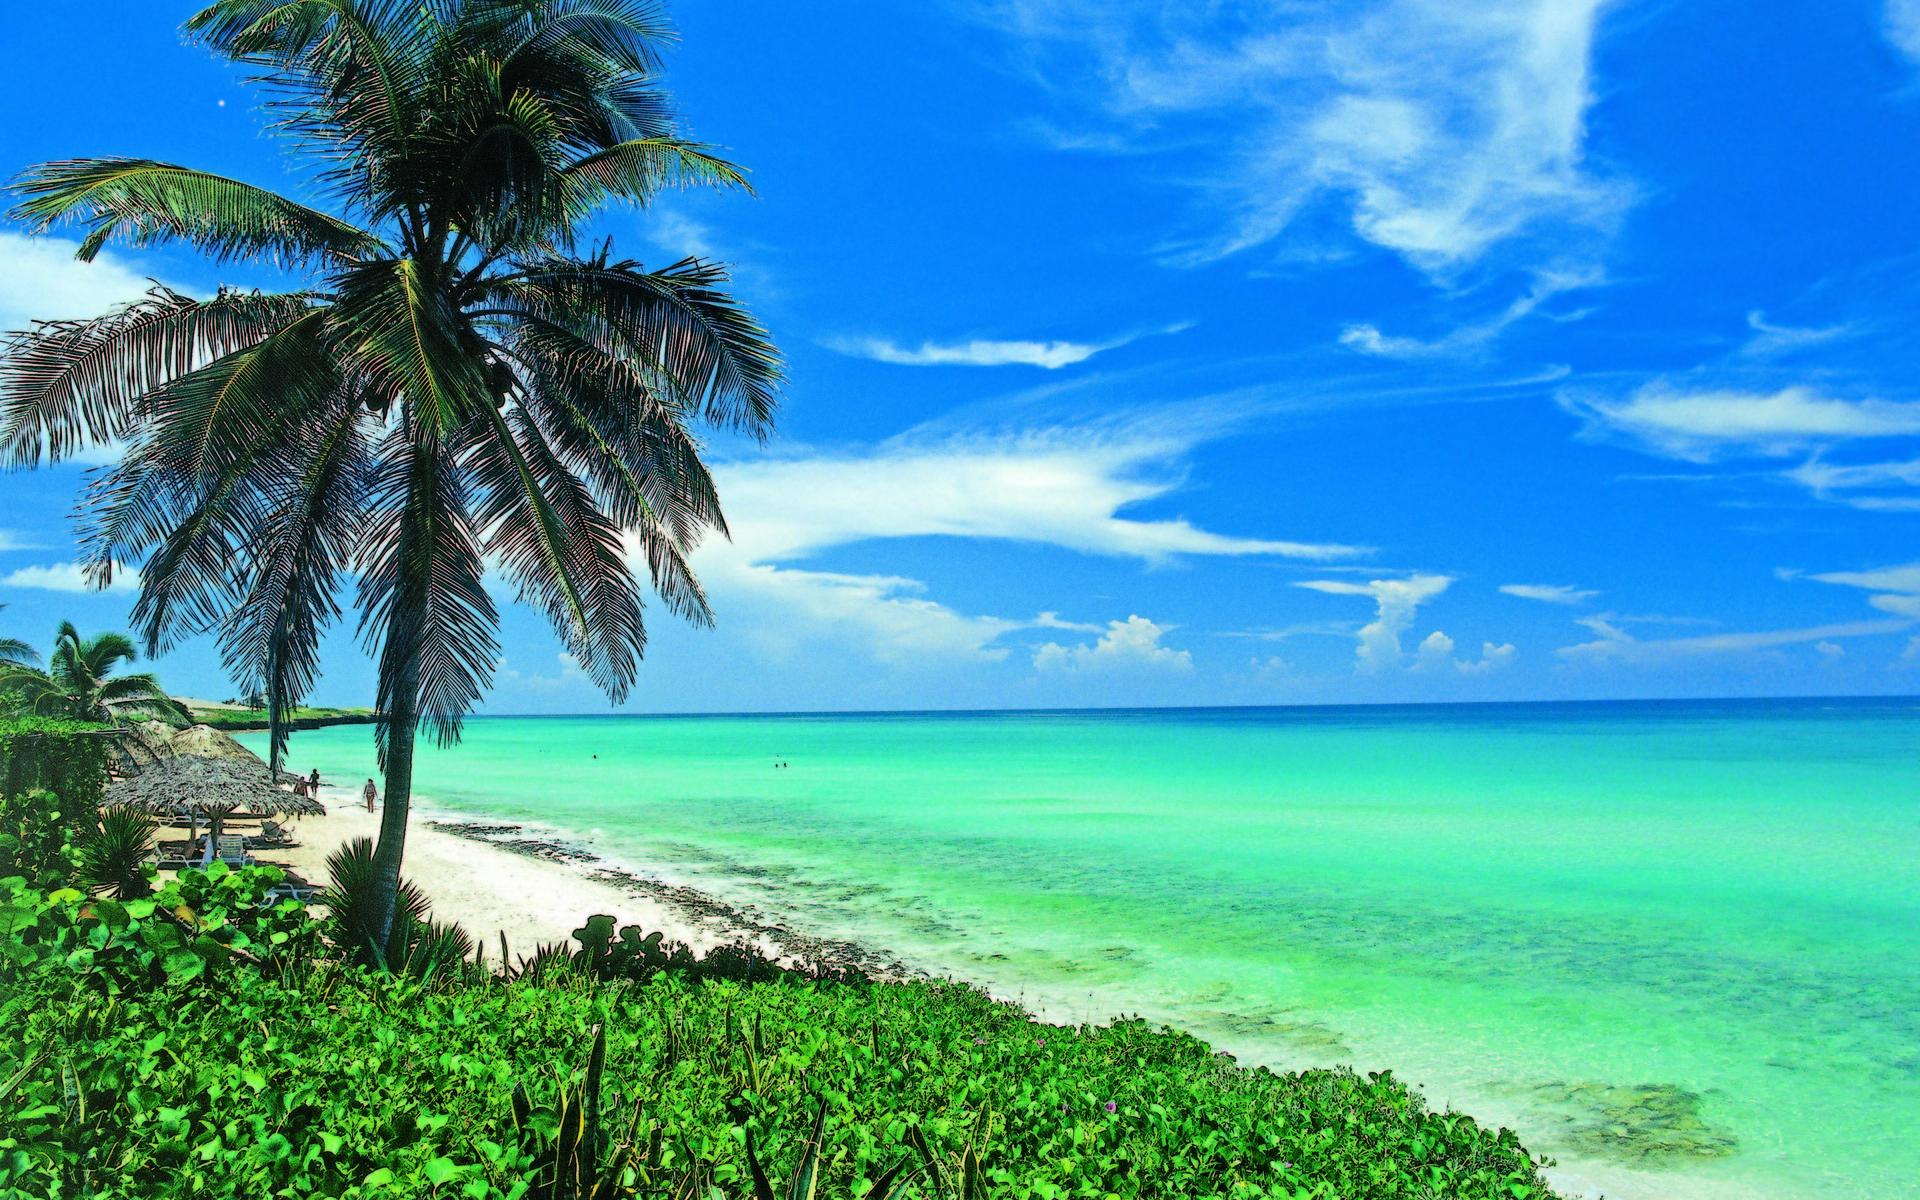 Fondo De Pantalla 1920x1200 Id: Beach In Cuba Fondo De Pantalla HD